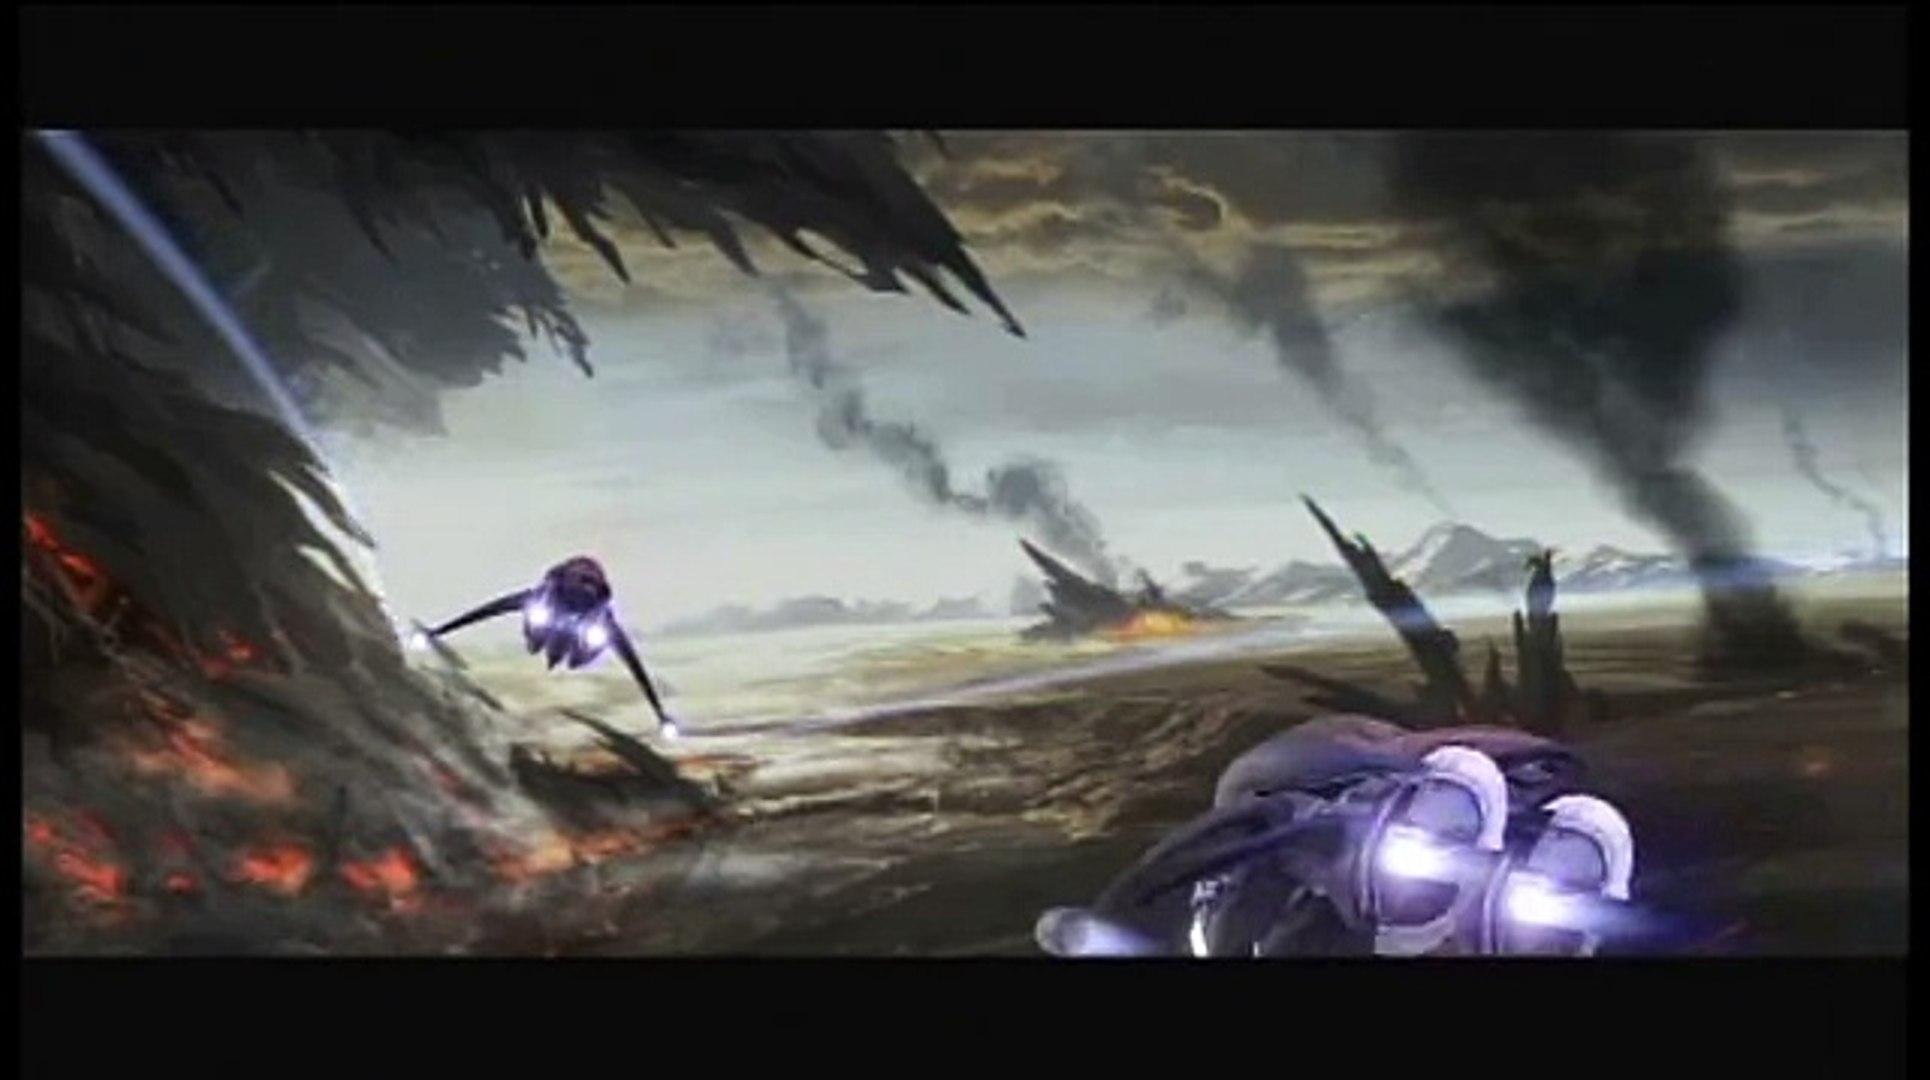 Cortana Opening Co-Op [Halo 3 cutscene]